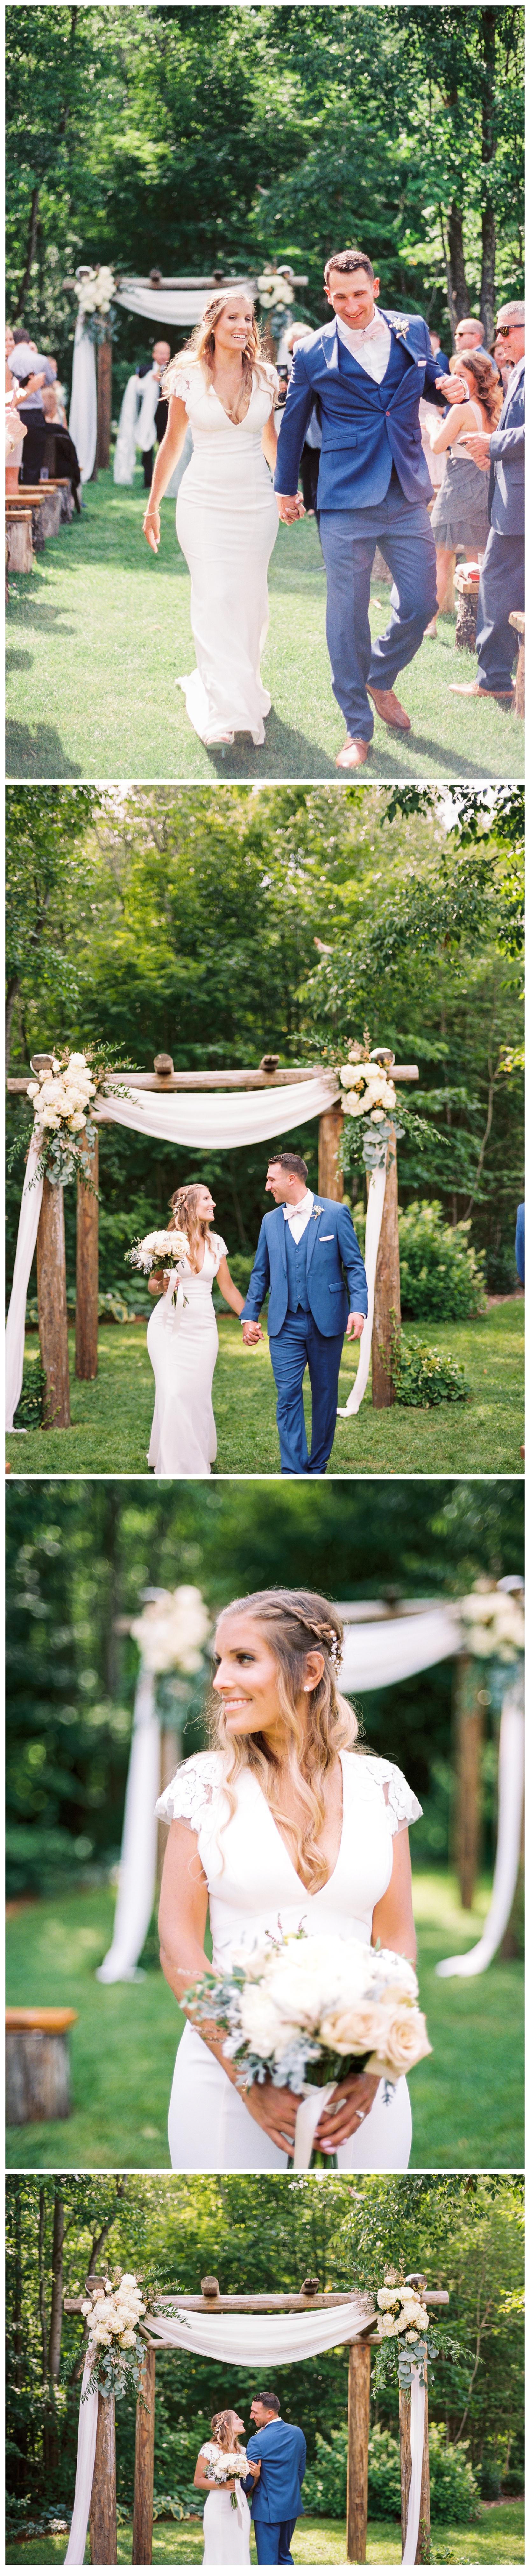 mad-river-barn-vermont-film-wedding-photography-9.jpg